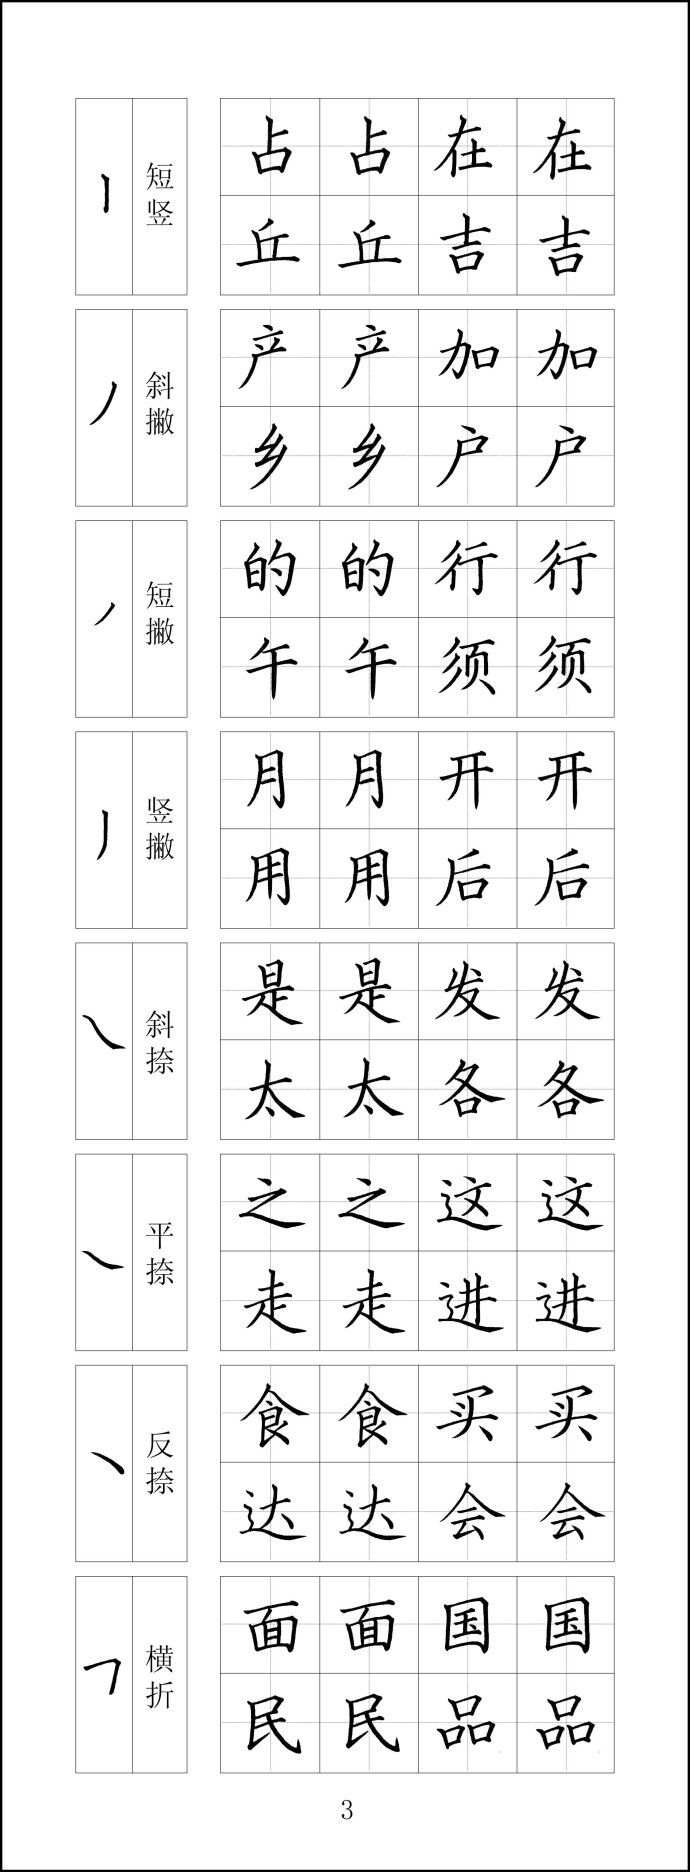 http://s13.sinaimg.cn/mw690/005LuAv9gy6Yxj7IUag4c&690_7best硬筆字帖imagesonPinterest|Menu,CrosswordandCrosswordpuzzles